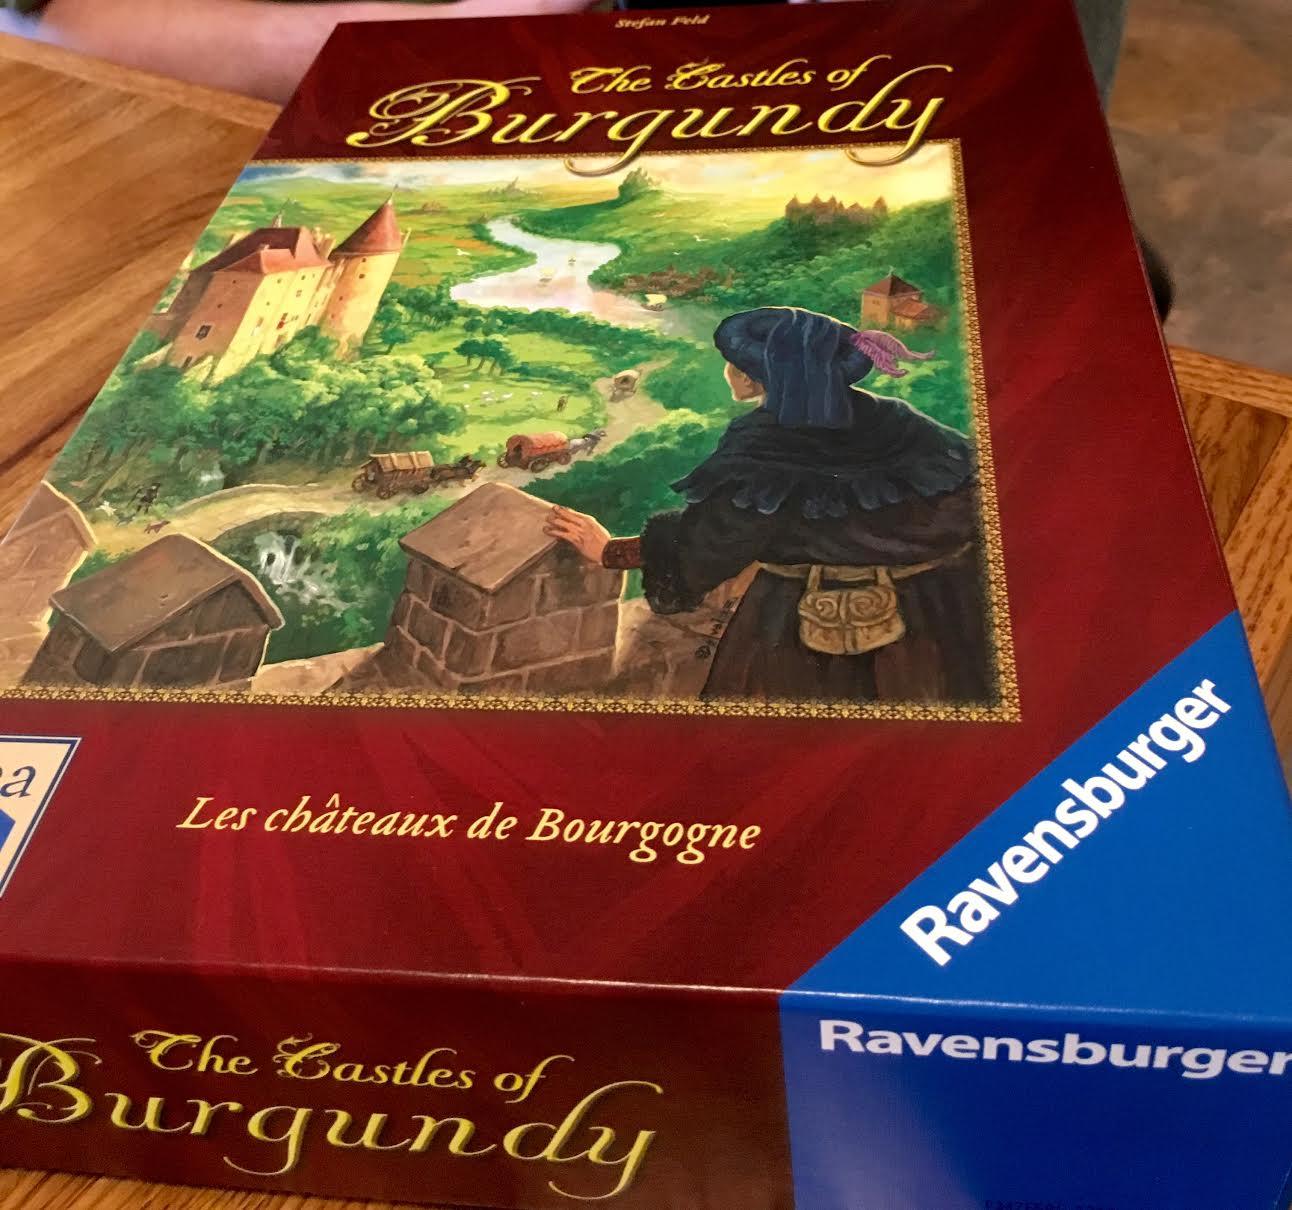 Monday Night Gaming Castles of Burgundy